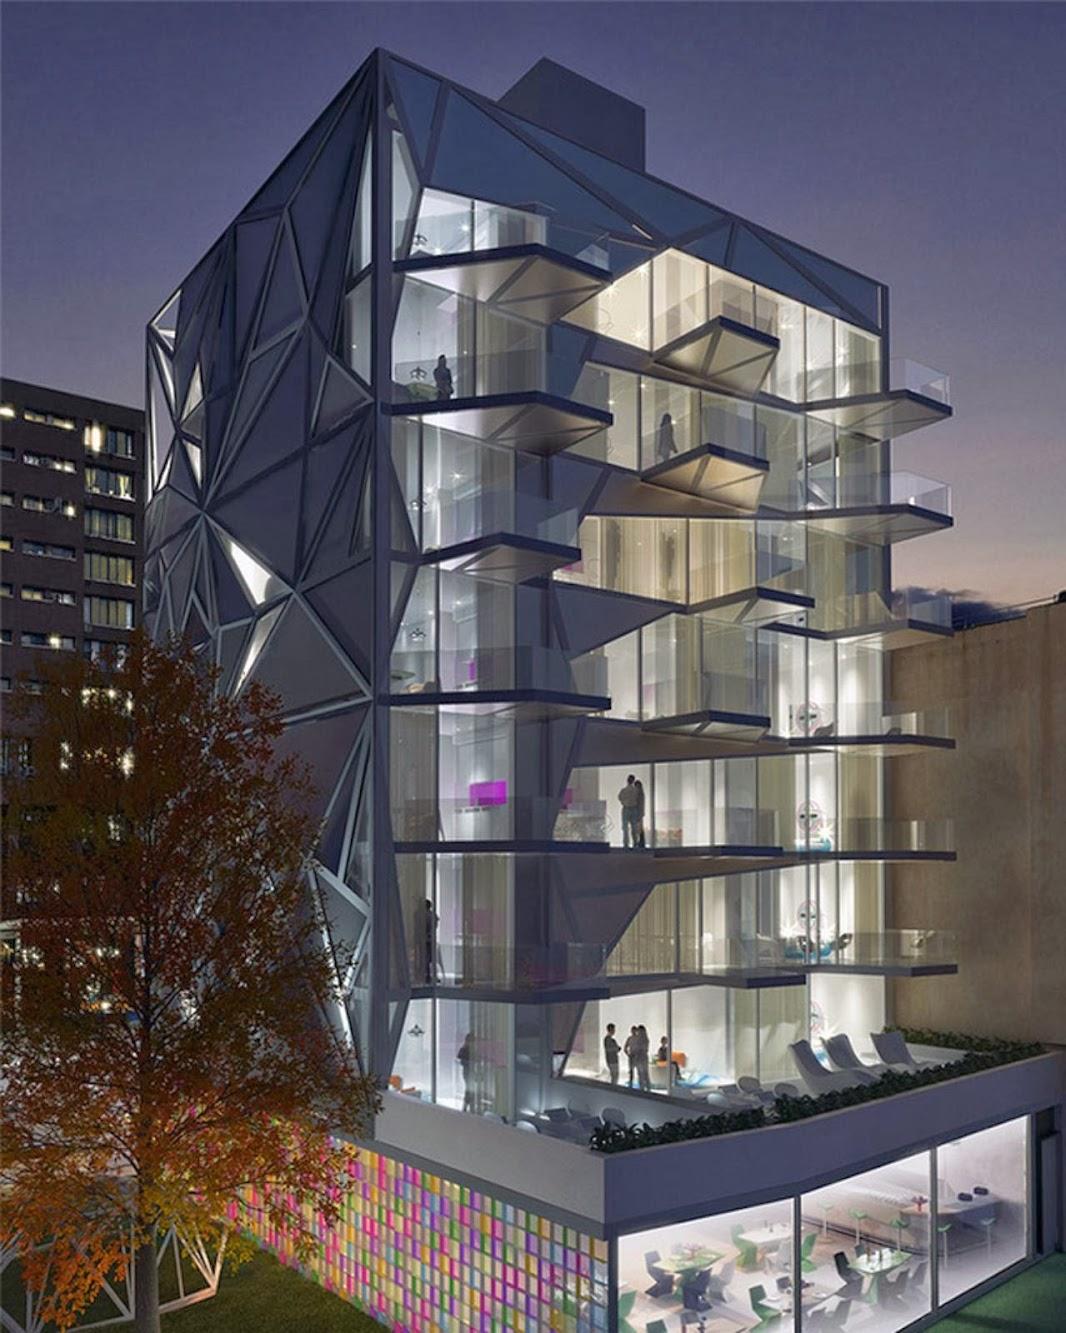 Atelier D Architecture Alexandre Dreyssé manhattan, new york, stati uniti: hap six nykarim rashid